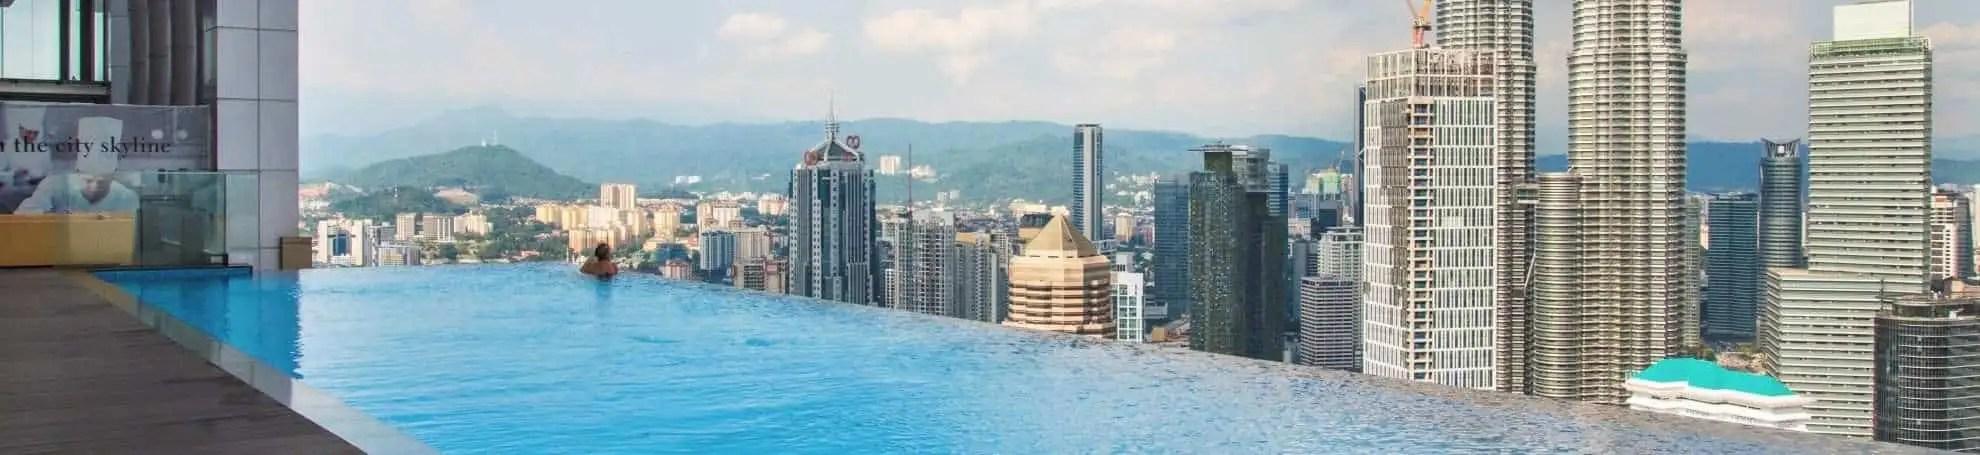 Victoria Home Platinum Suites Kuala Lumpur Malaysia Review